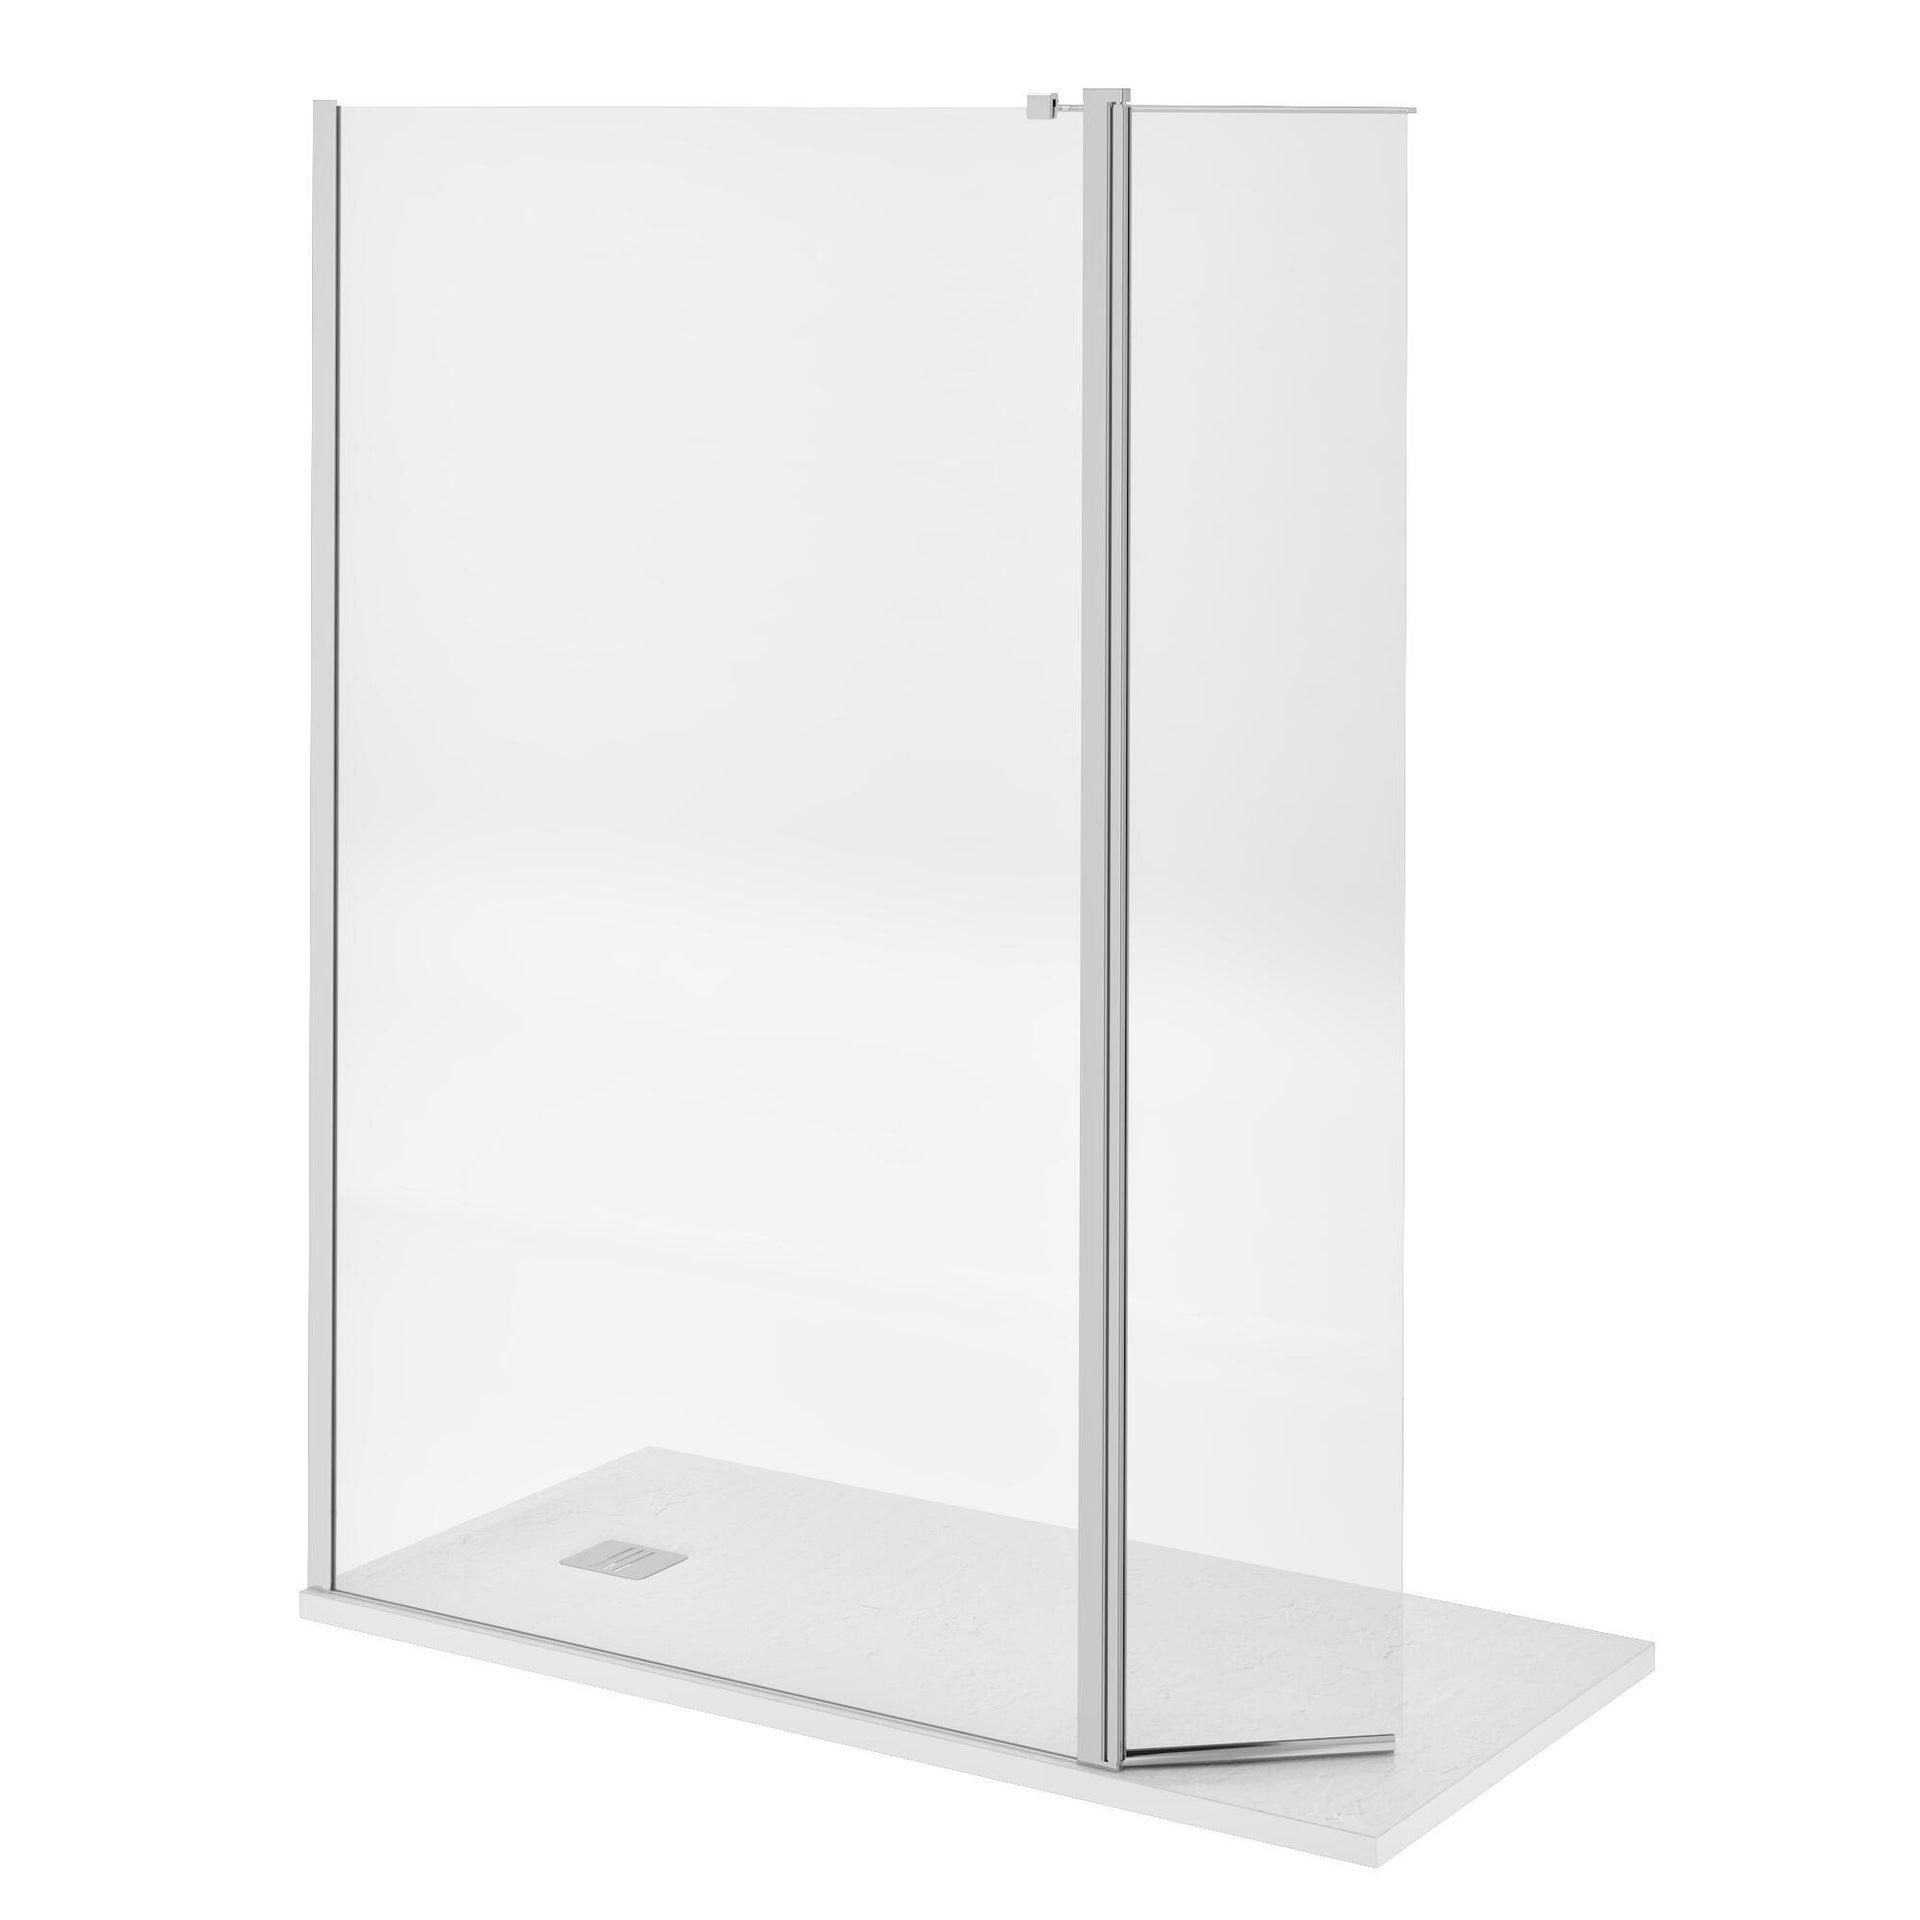 Doccia walk in L 120, H 200 cm, vetro 8 mm trasparente cromato - 17